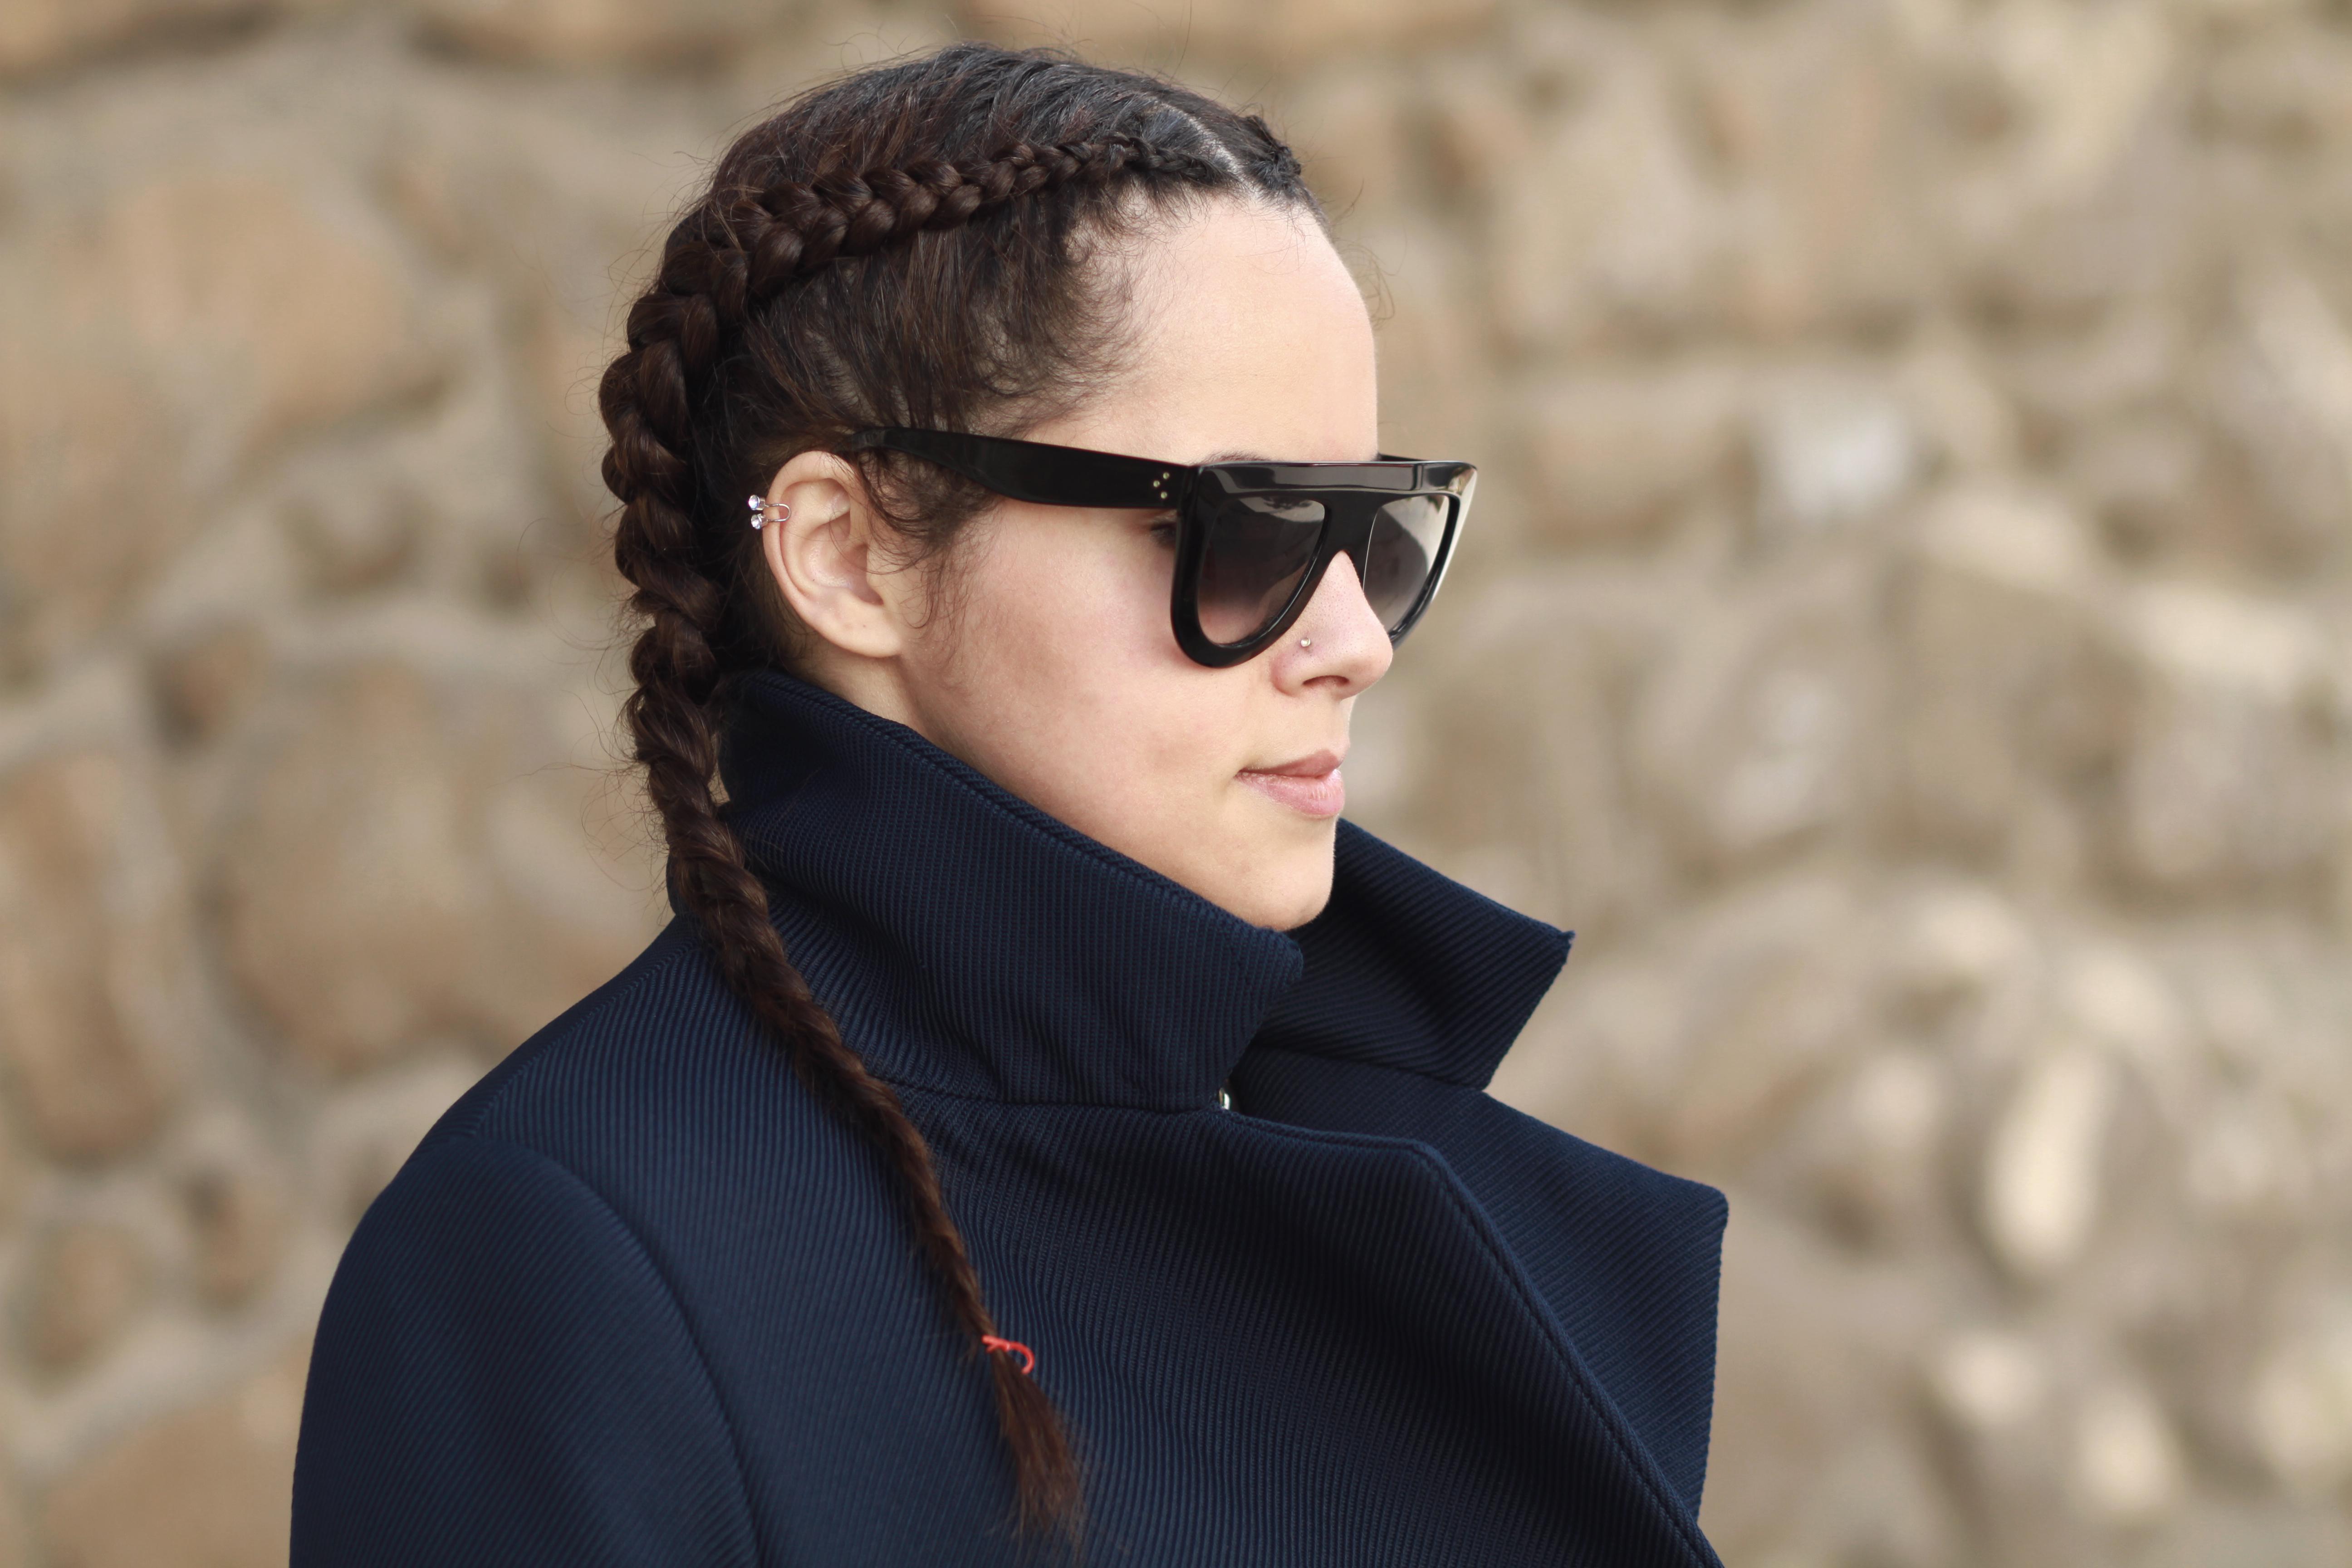 Cornrow-braids-blog-mode-chiccarpediem-8